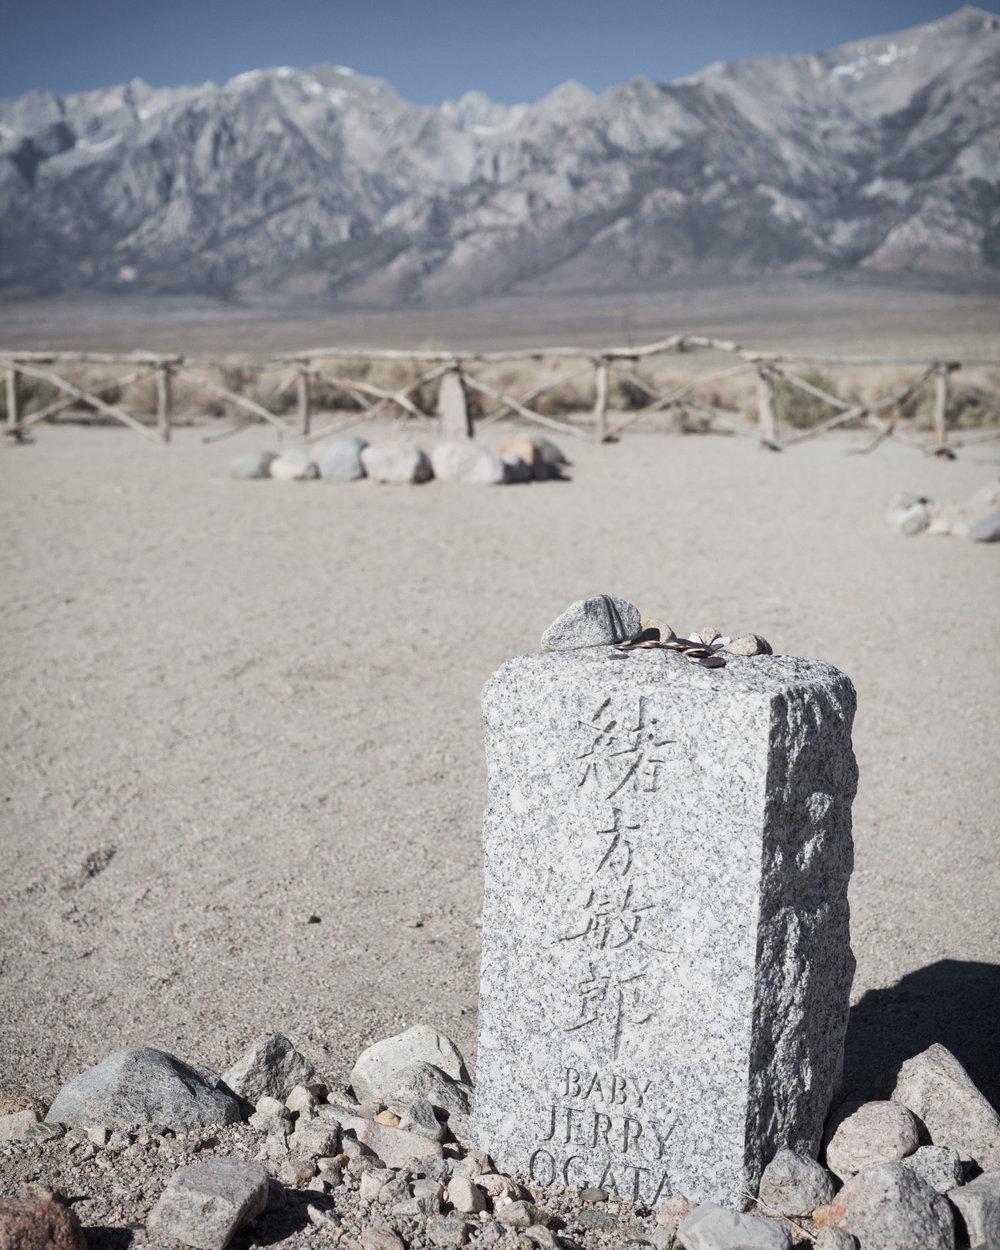 Title:      Baby Jerry Ogata      (Manzanar, California)